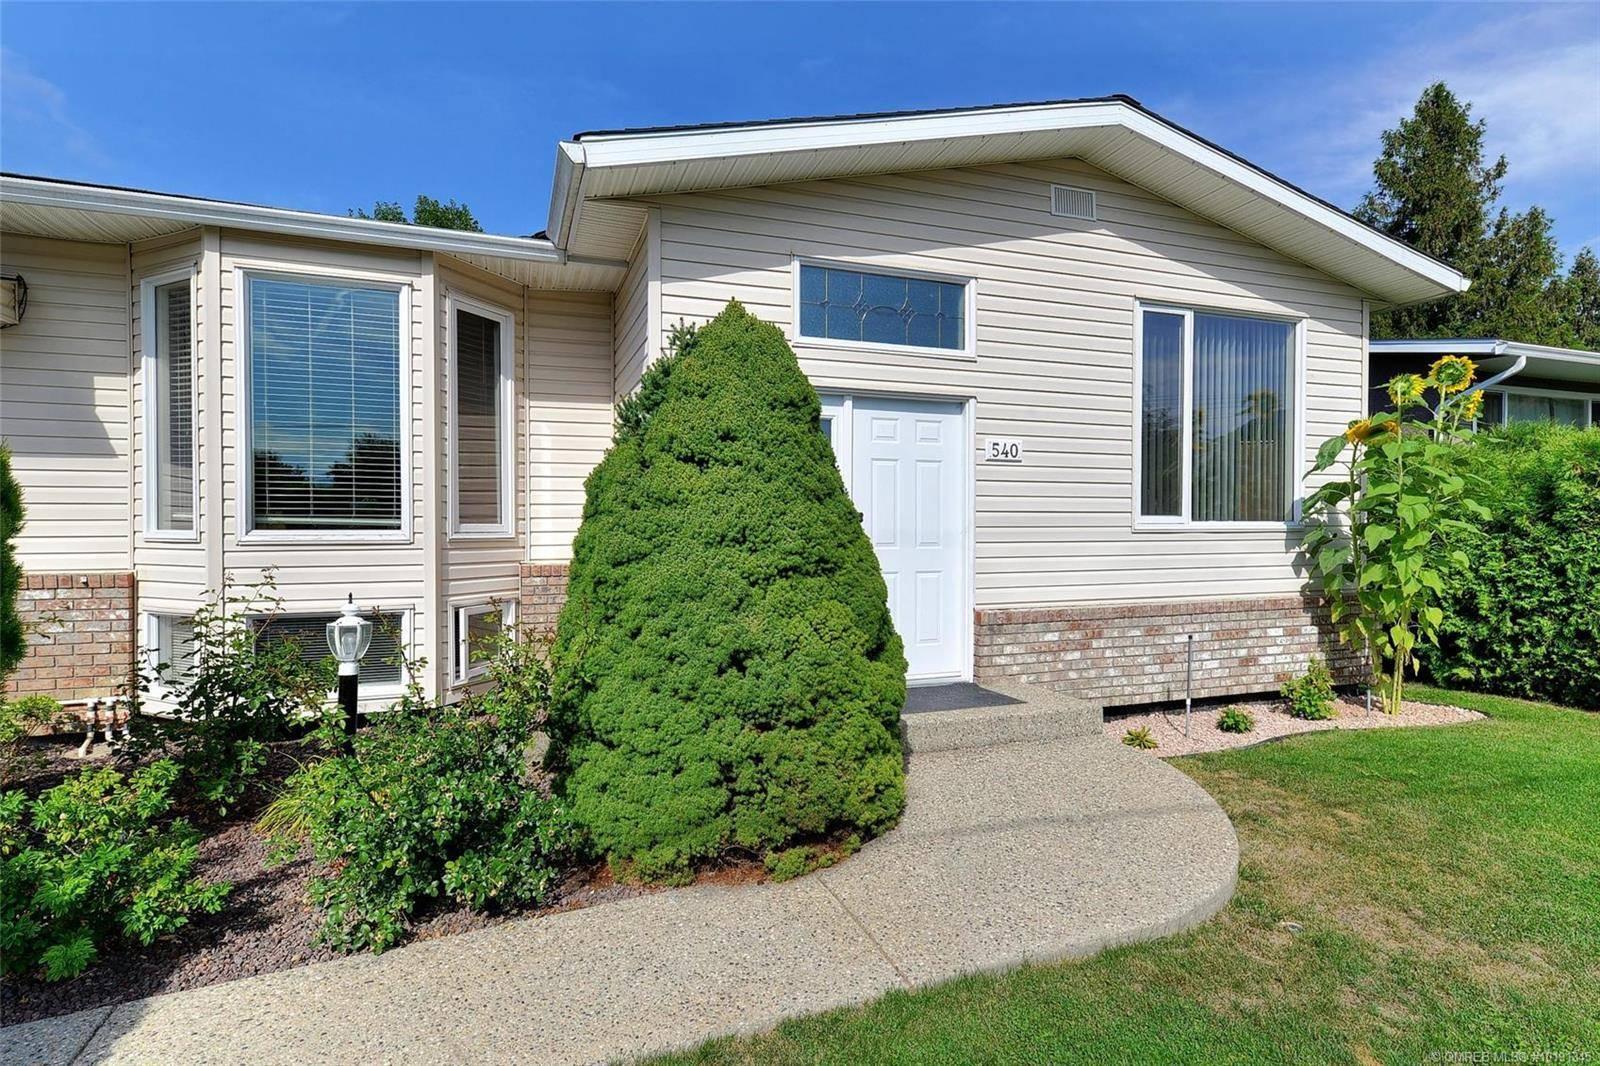 House for sale at 540 Patrick Rd Kelowna British Columbia - MLS: 10191345